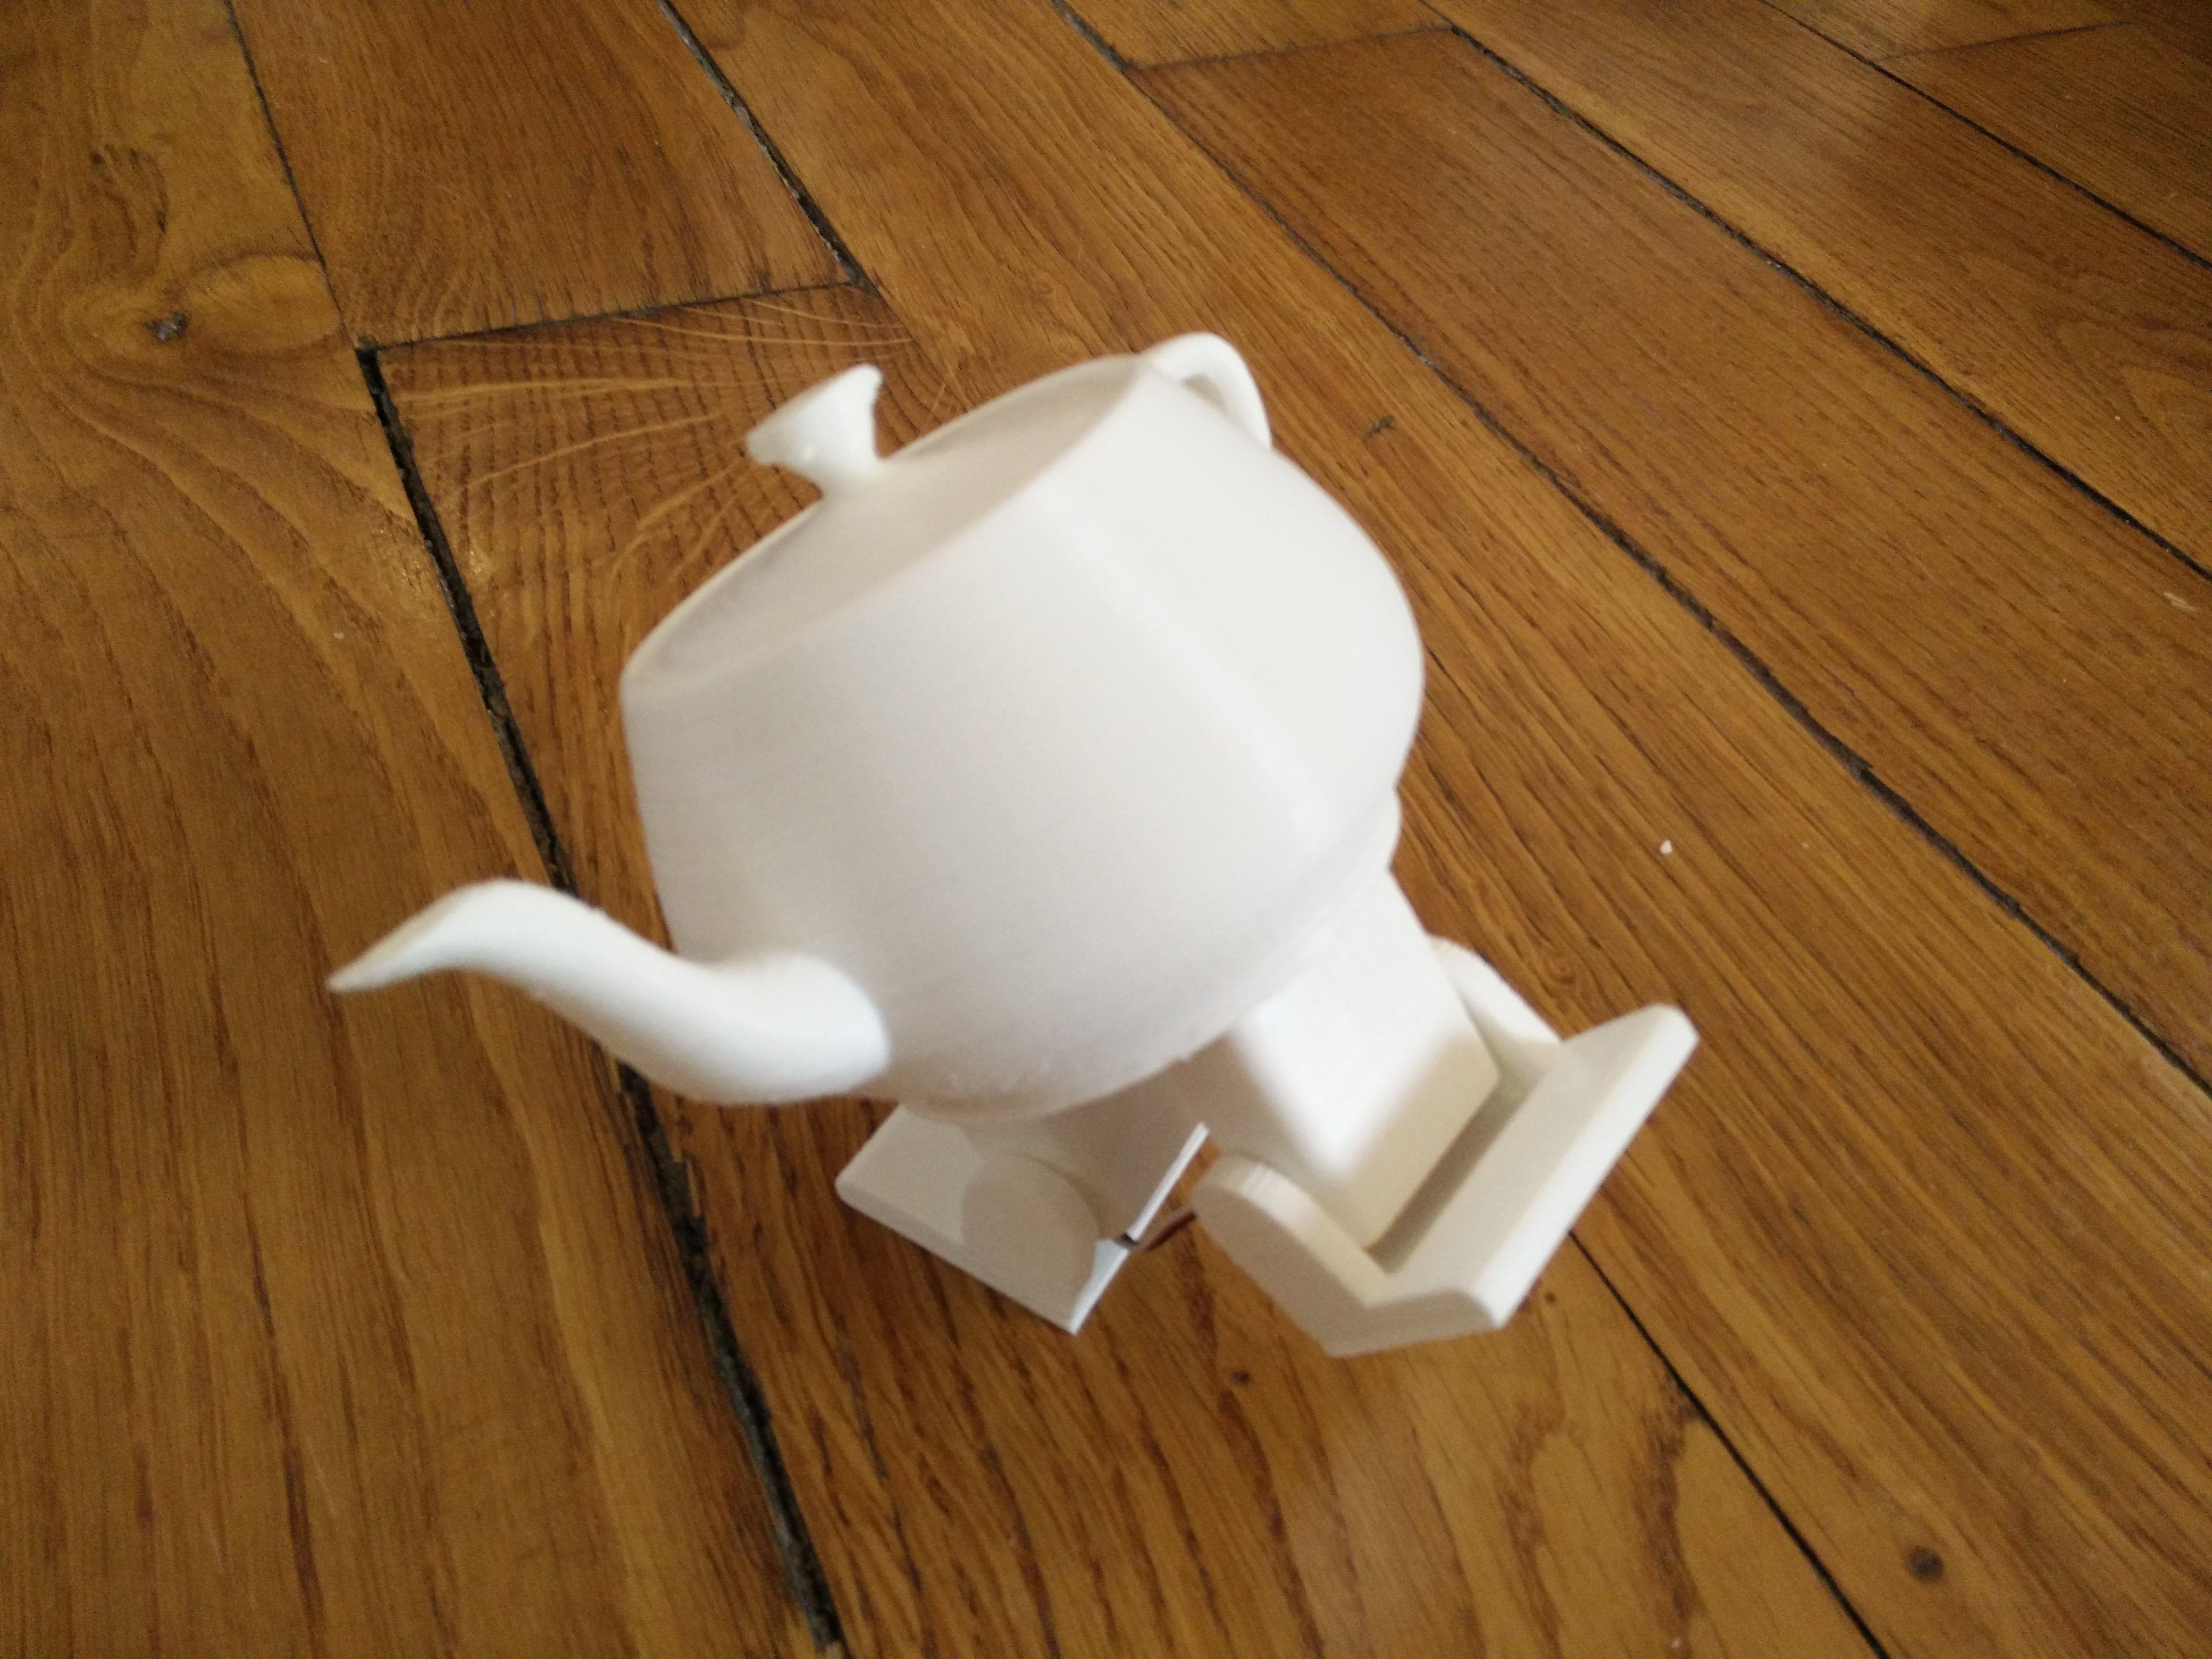 Plasteac: a dancing teapot